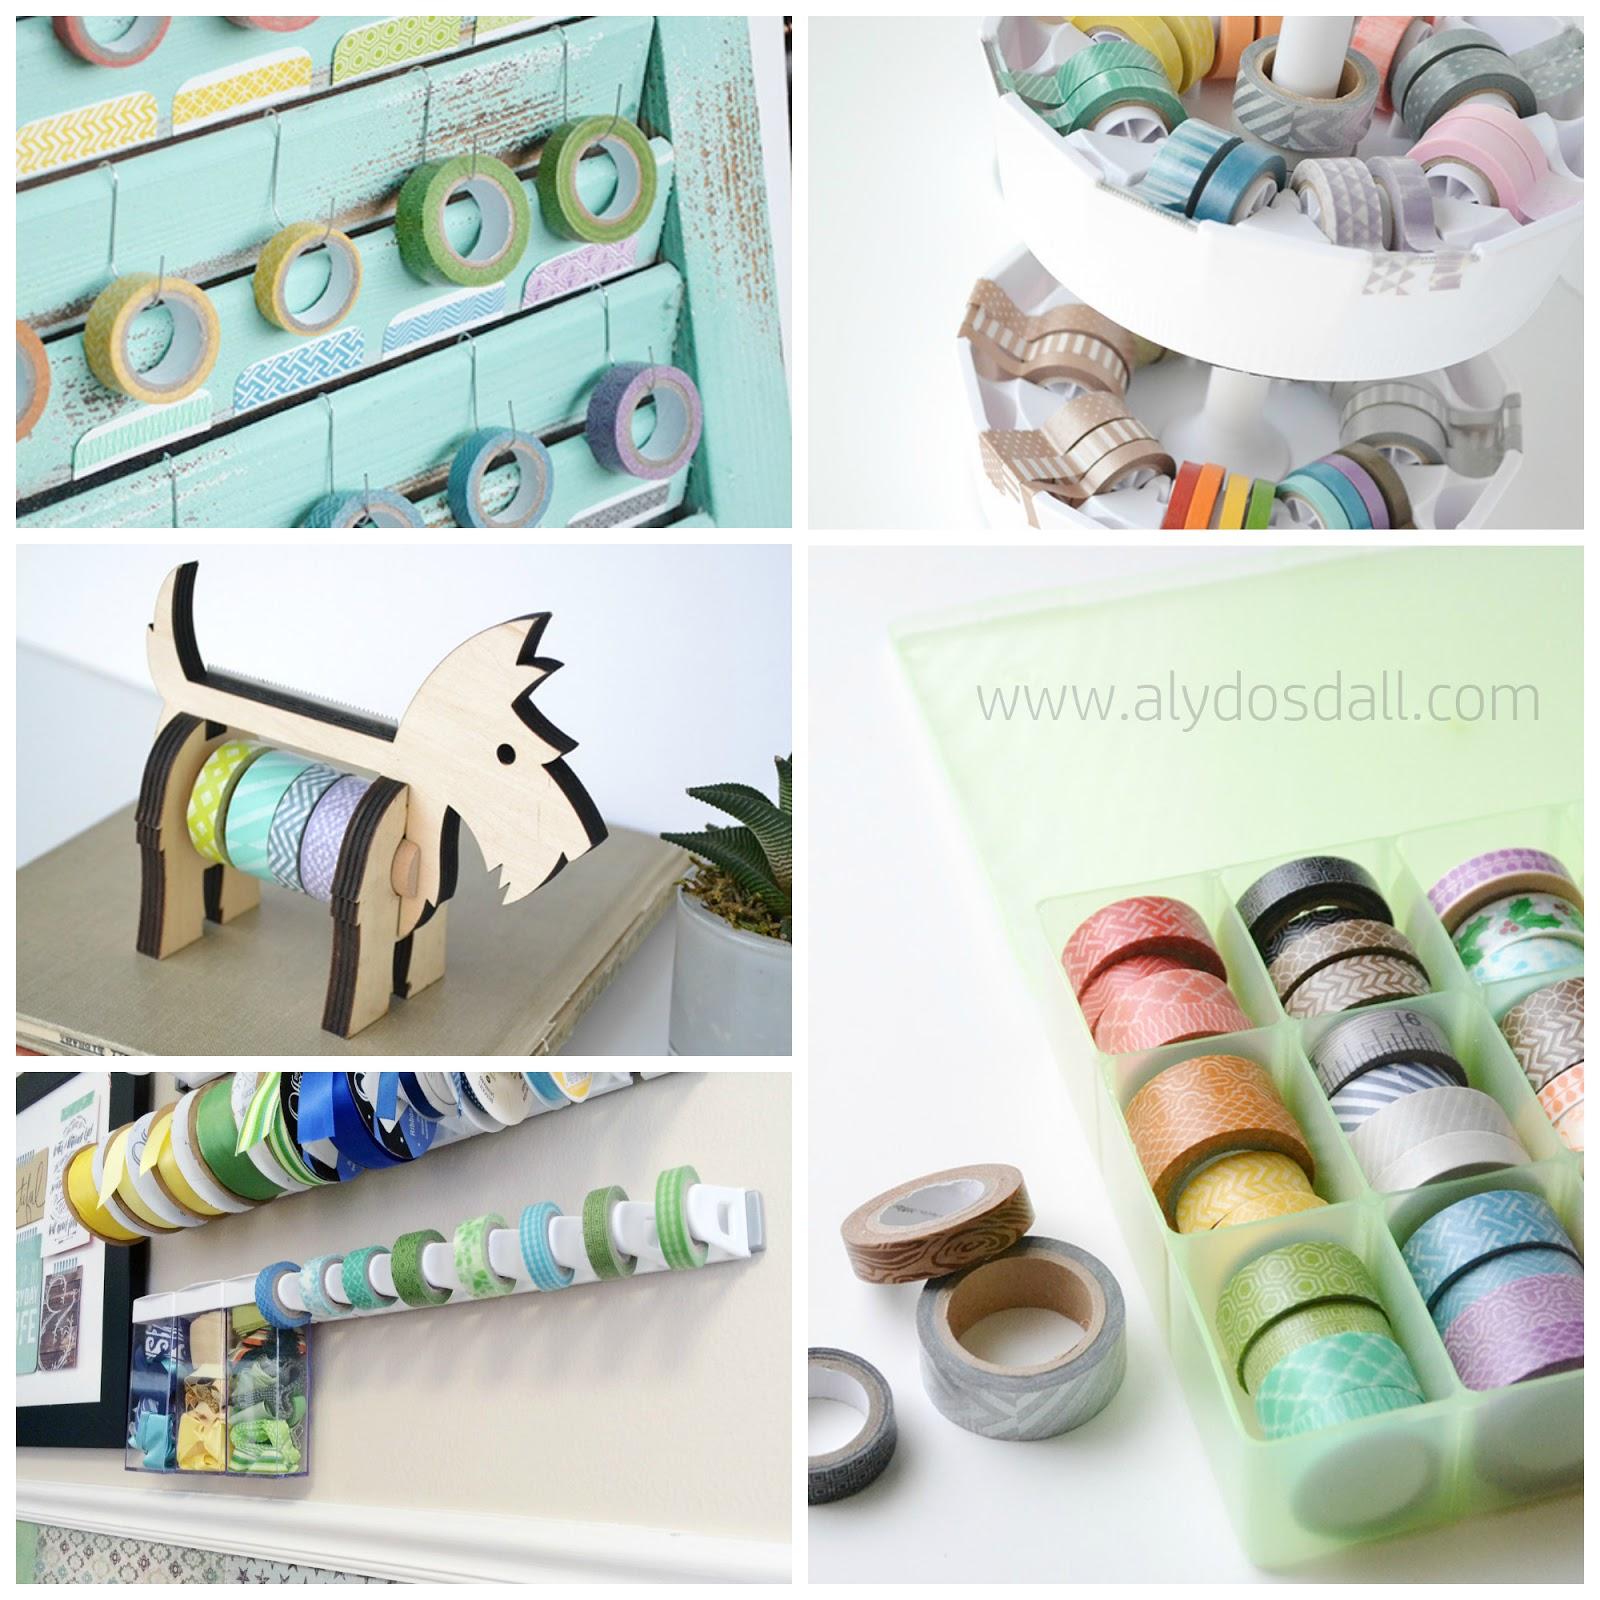 Washi Tape Ideas: Aly Dosdall: 5 Washi Tape Storage Ideas